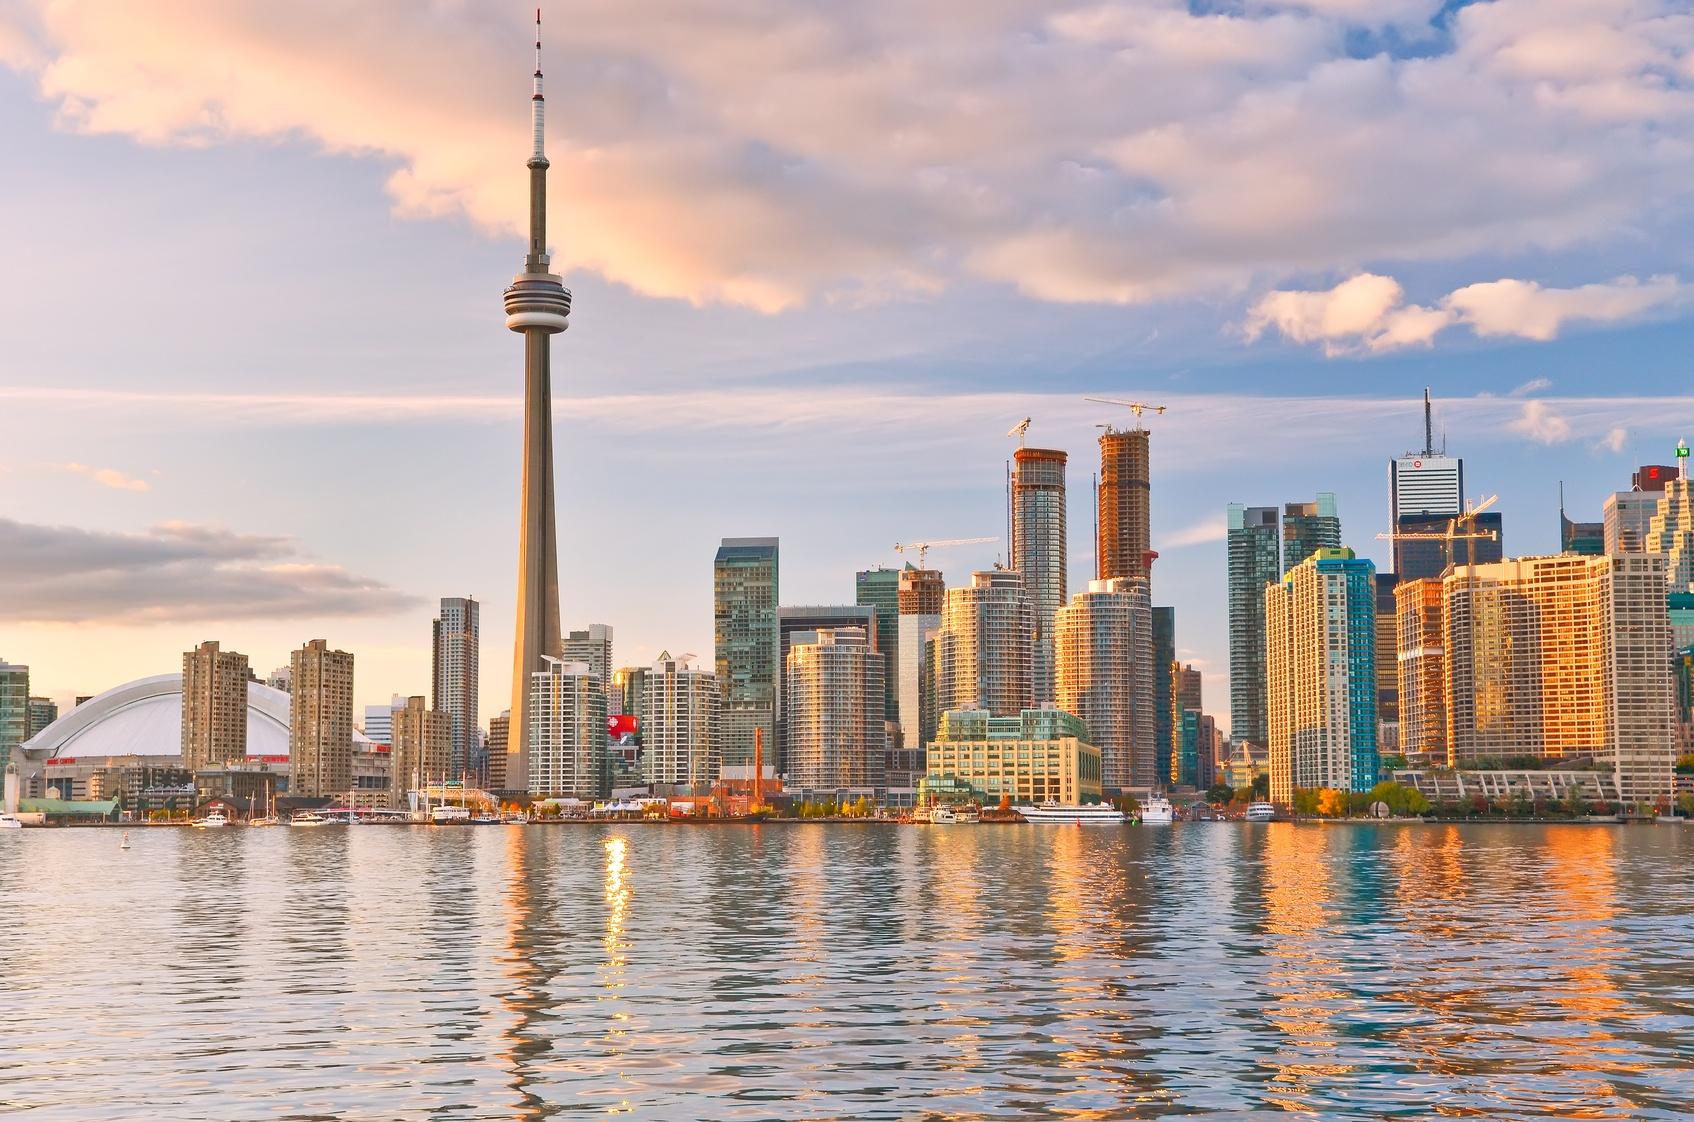 Toronto, Ontario cityscape